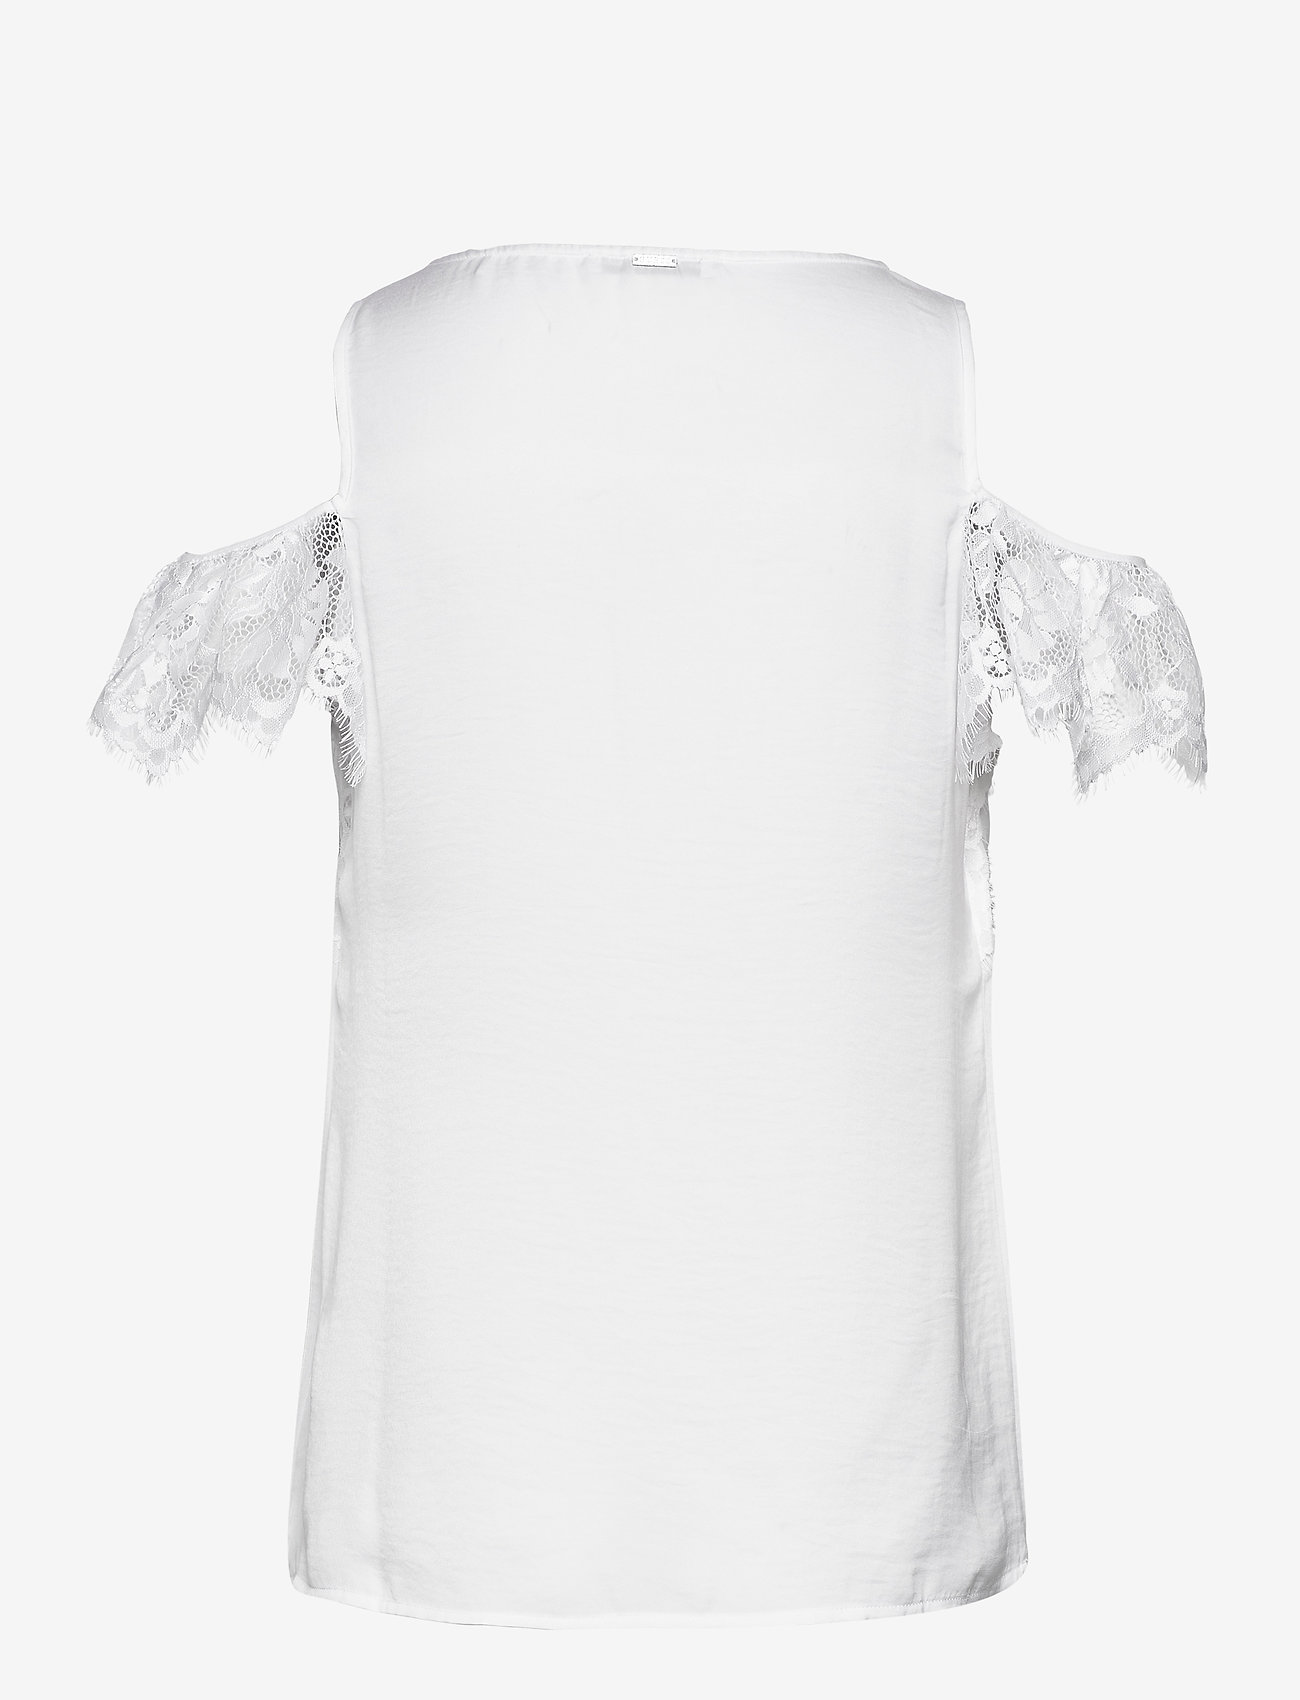 GUESS Jeans - SL MARIAH TOP - t-shirts - true white a000 - 1